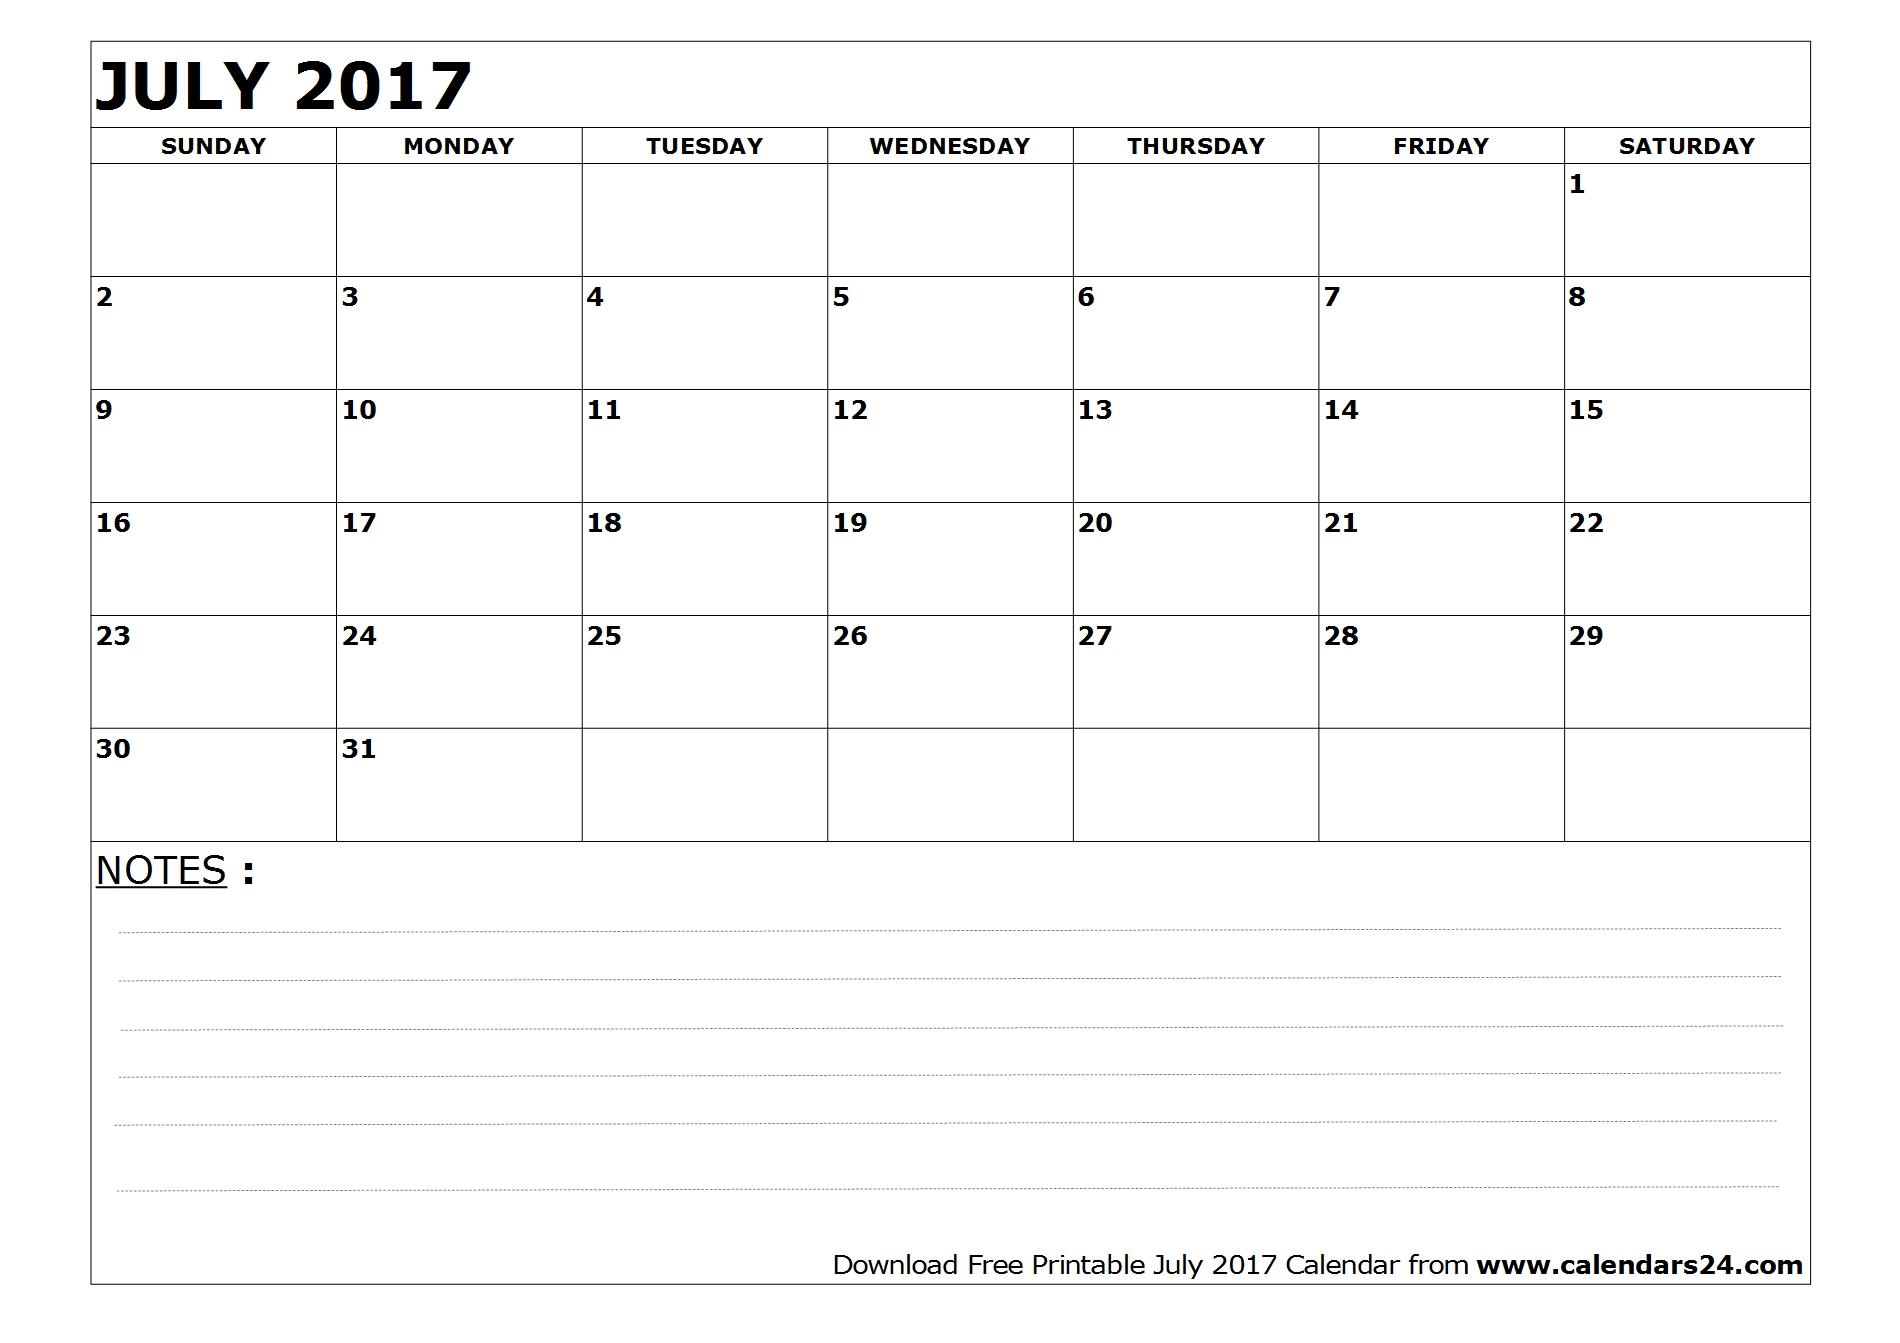 Print July 2017 calendar